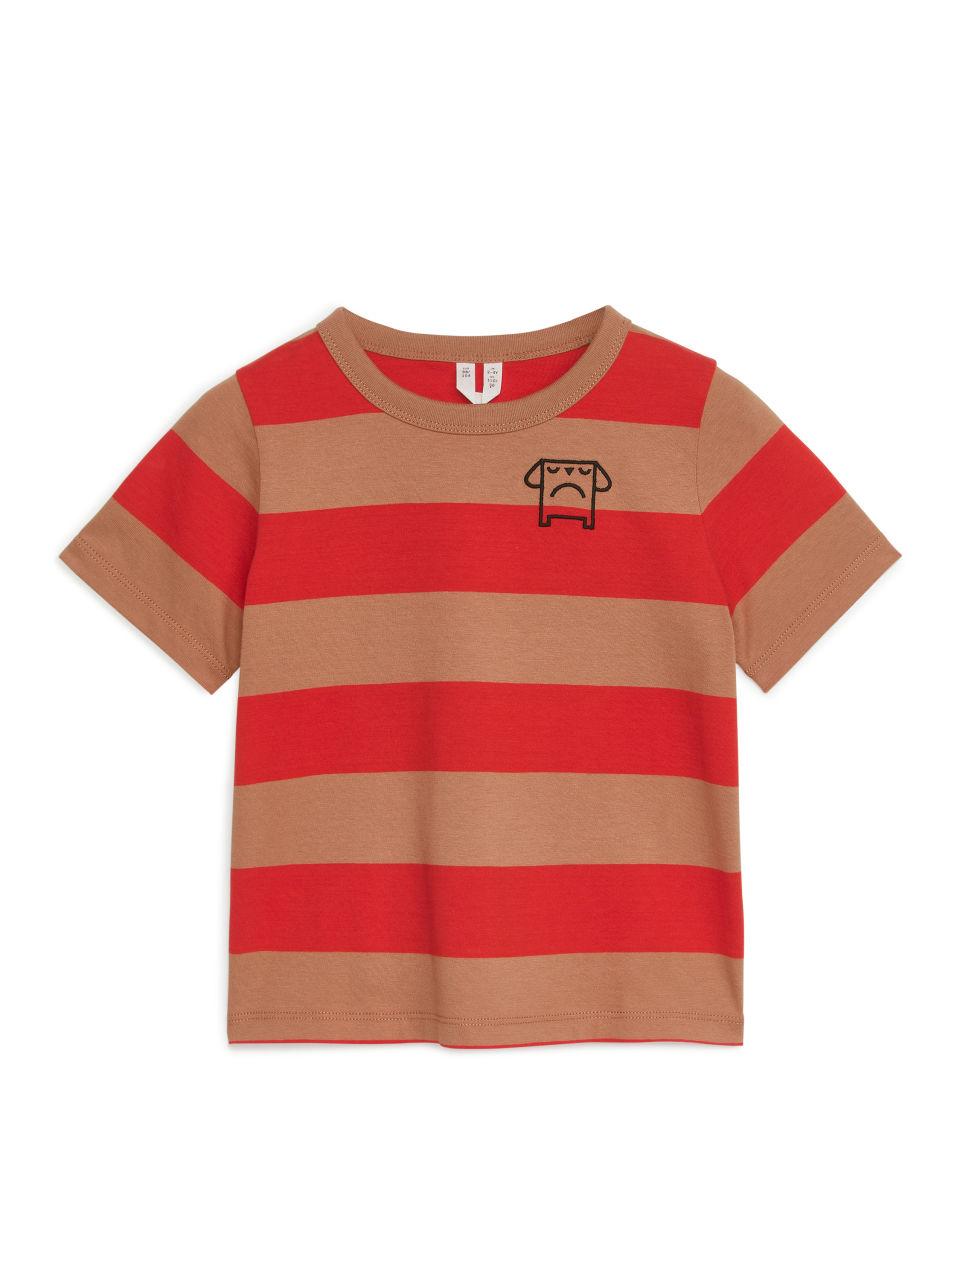 Block-Striped T-Shirt - Red